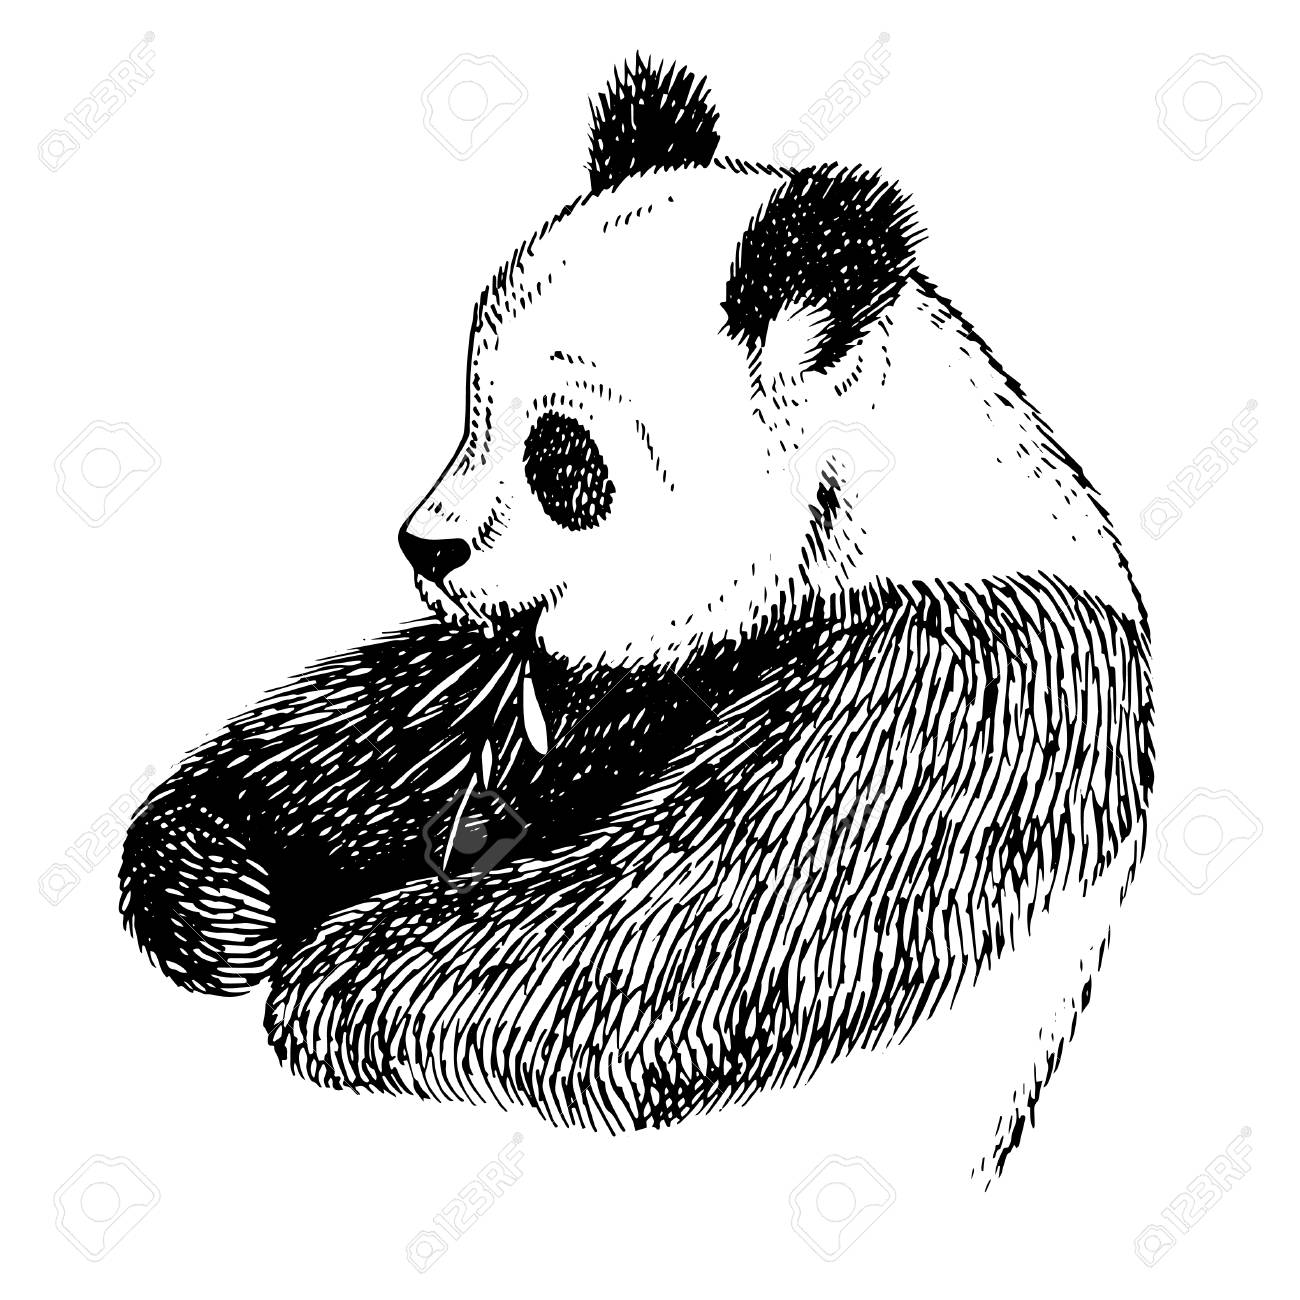 1300x1300 Sketch Panda With Bamboo. Engrave Ink Draw Panda Illustration